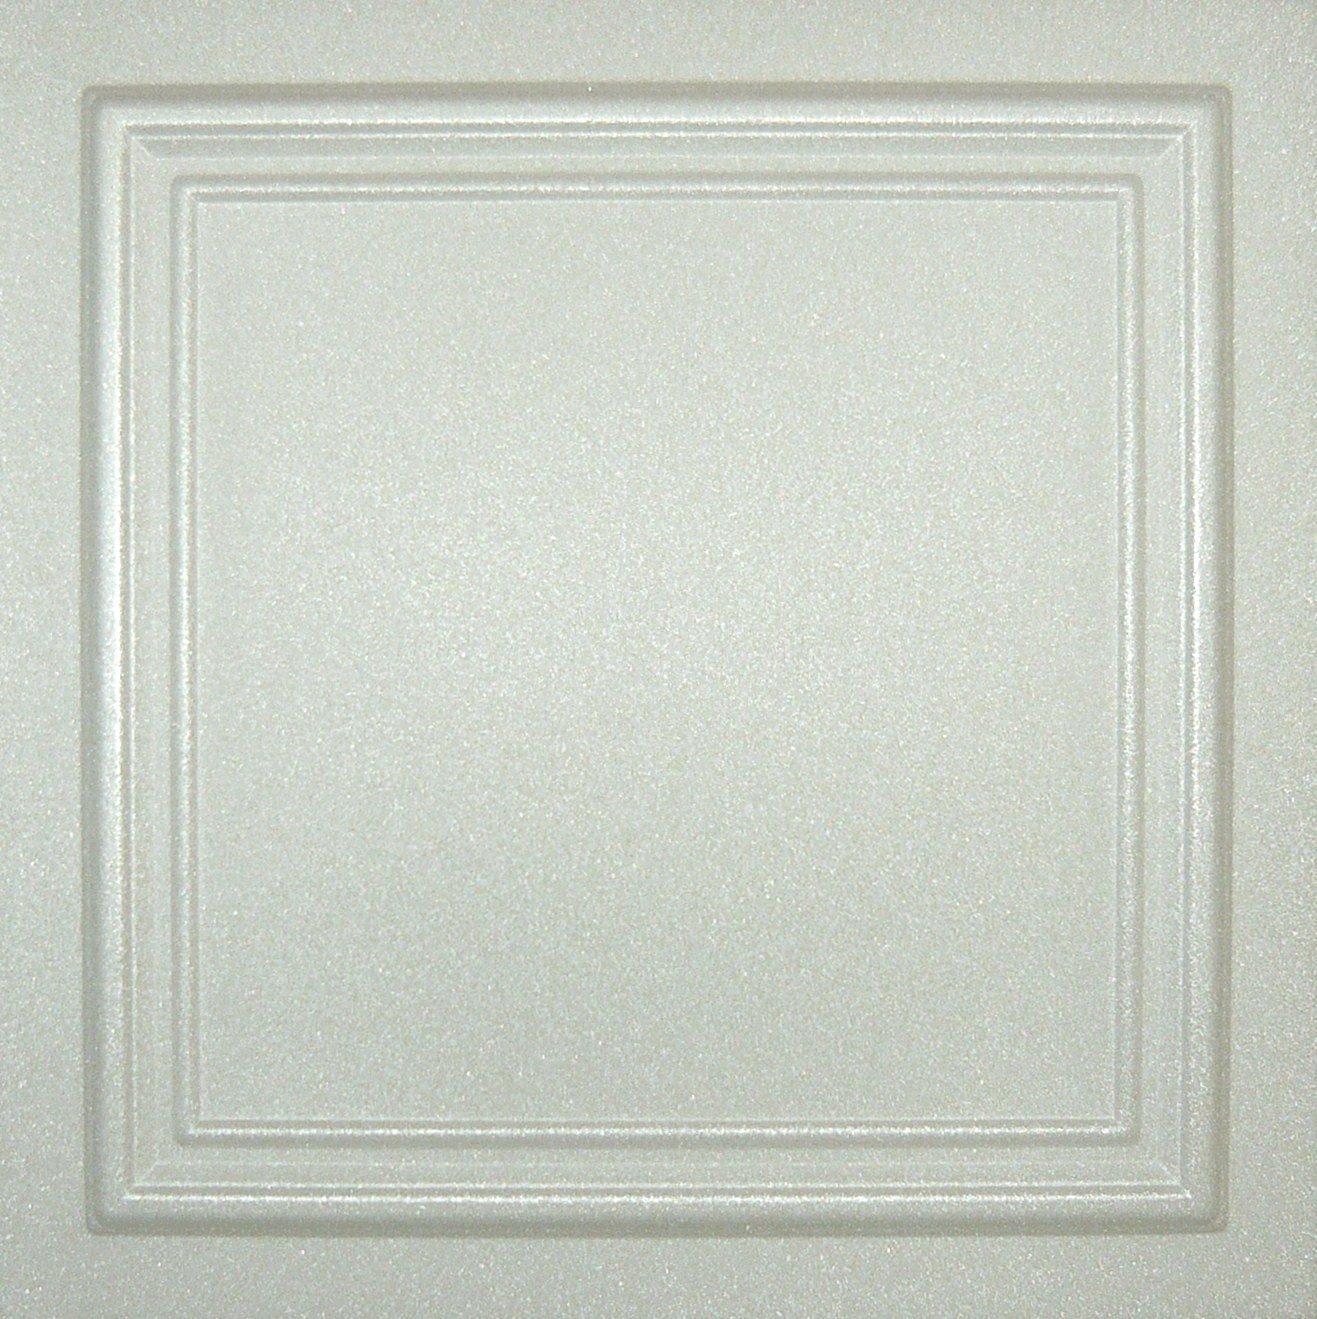 Buy R24w White 20x20 Amazing Styrofoam Ceiling Tiles Easy To Glue Up